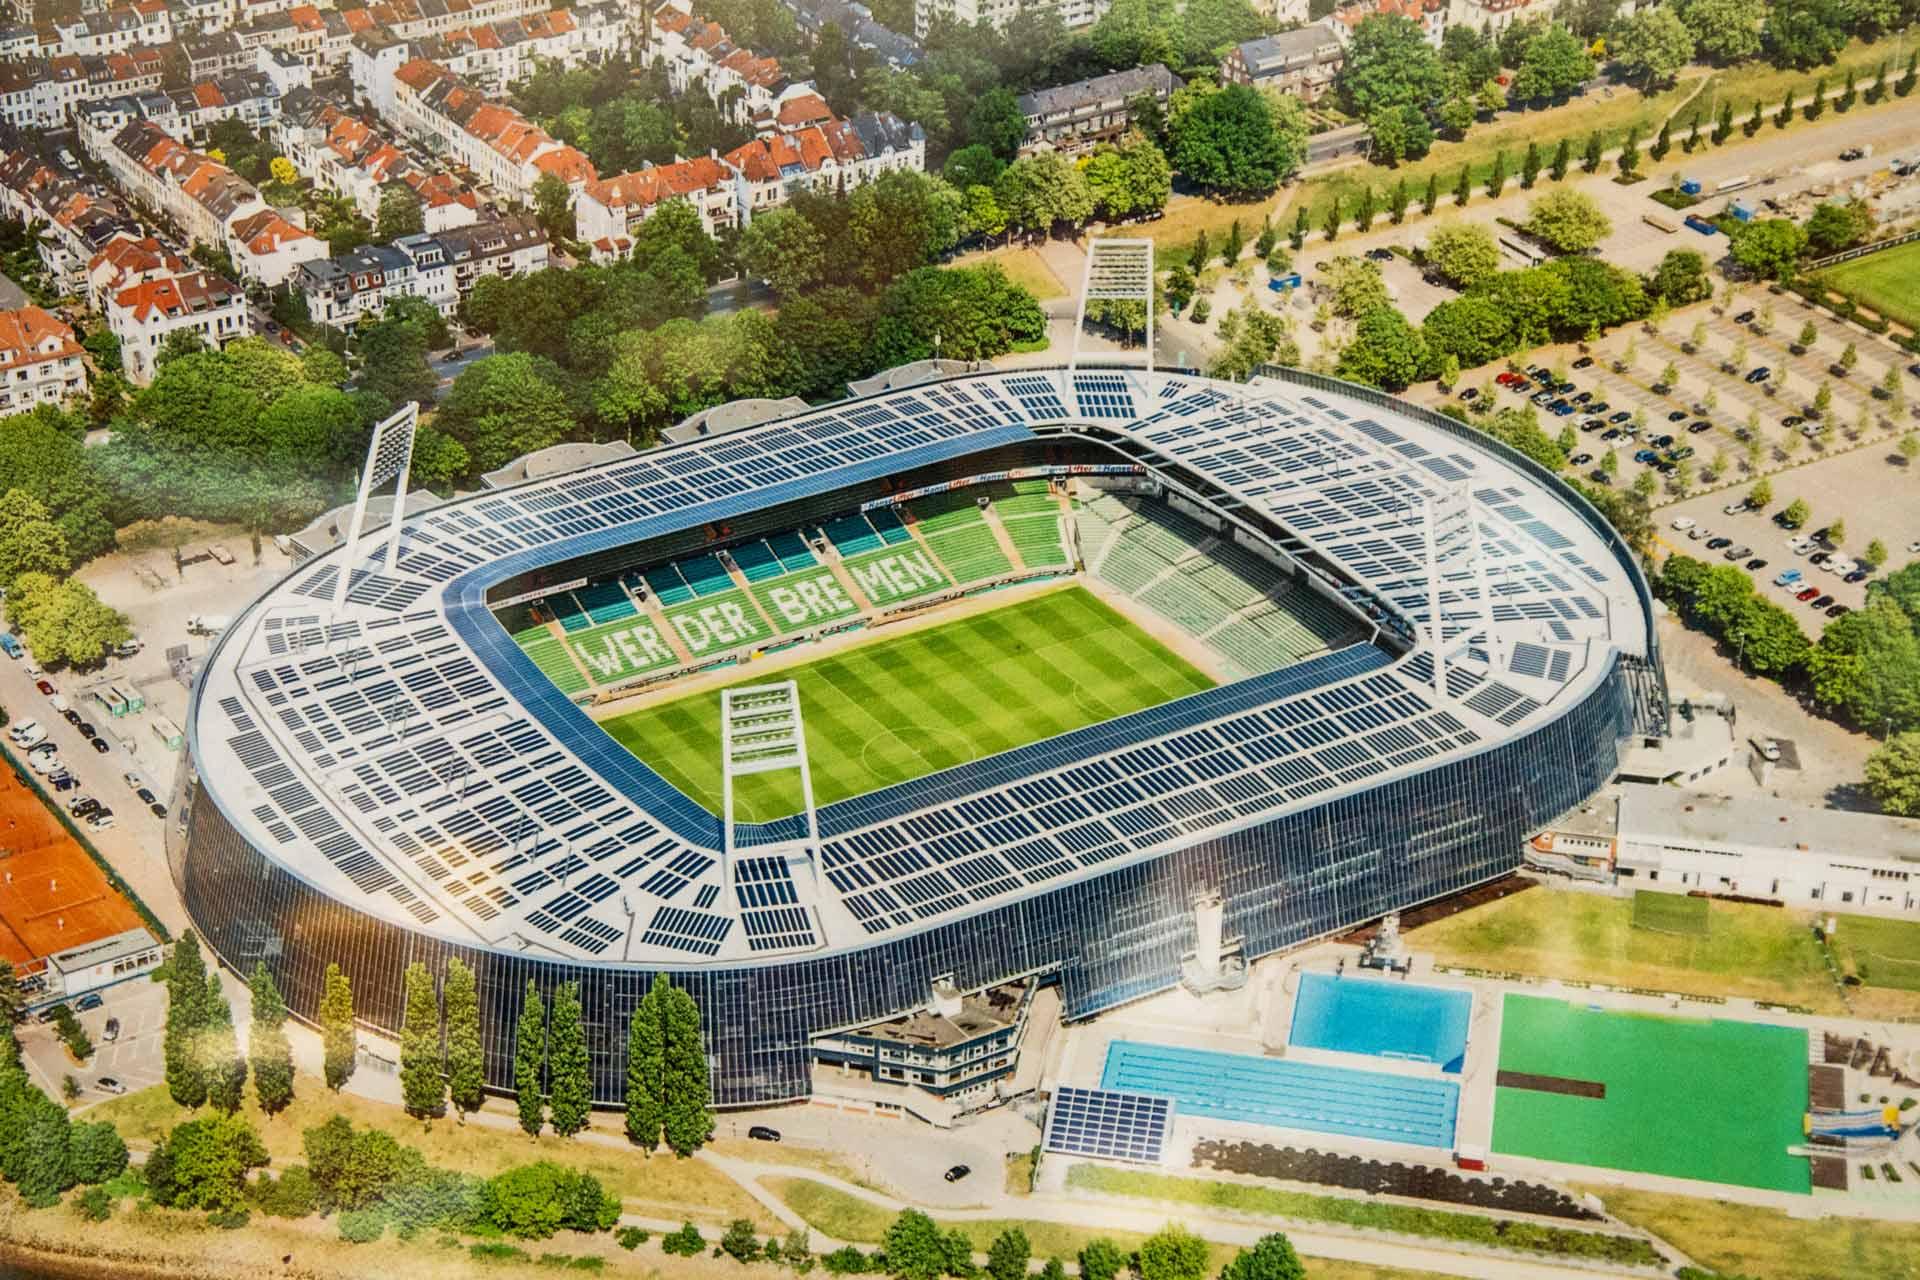 Weserstadion in Bremen